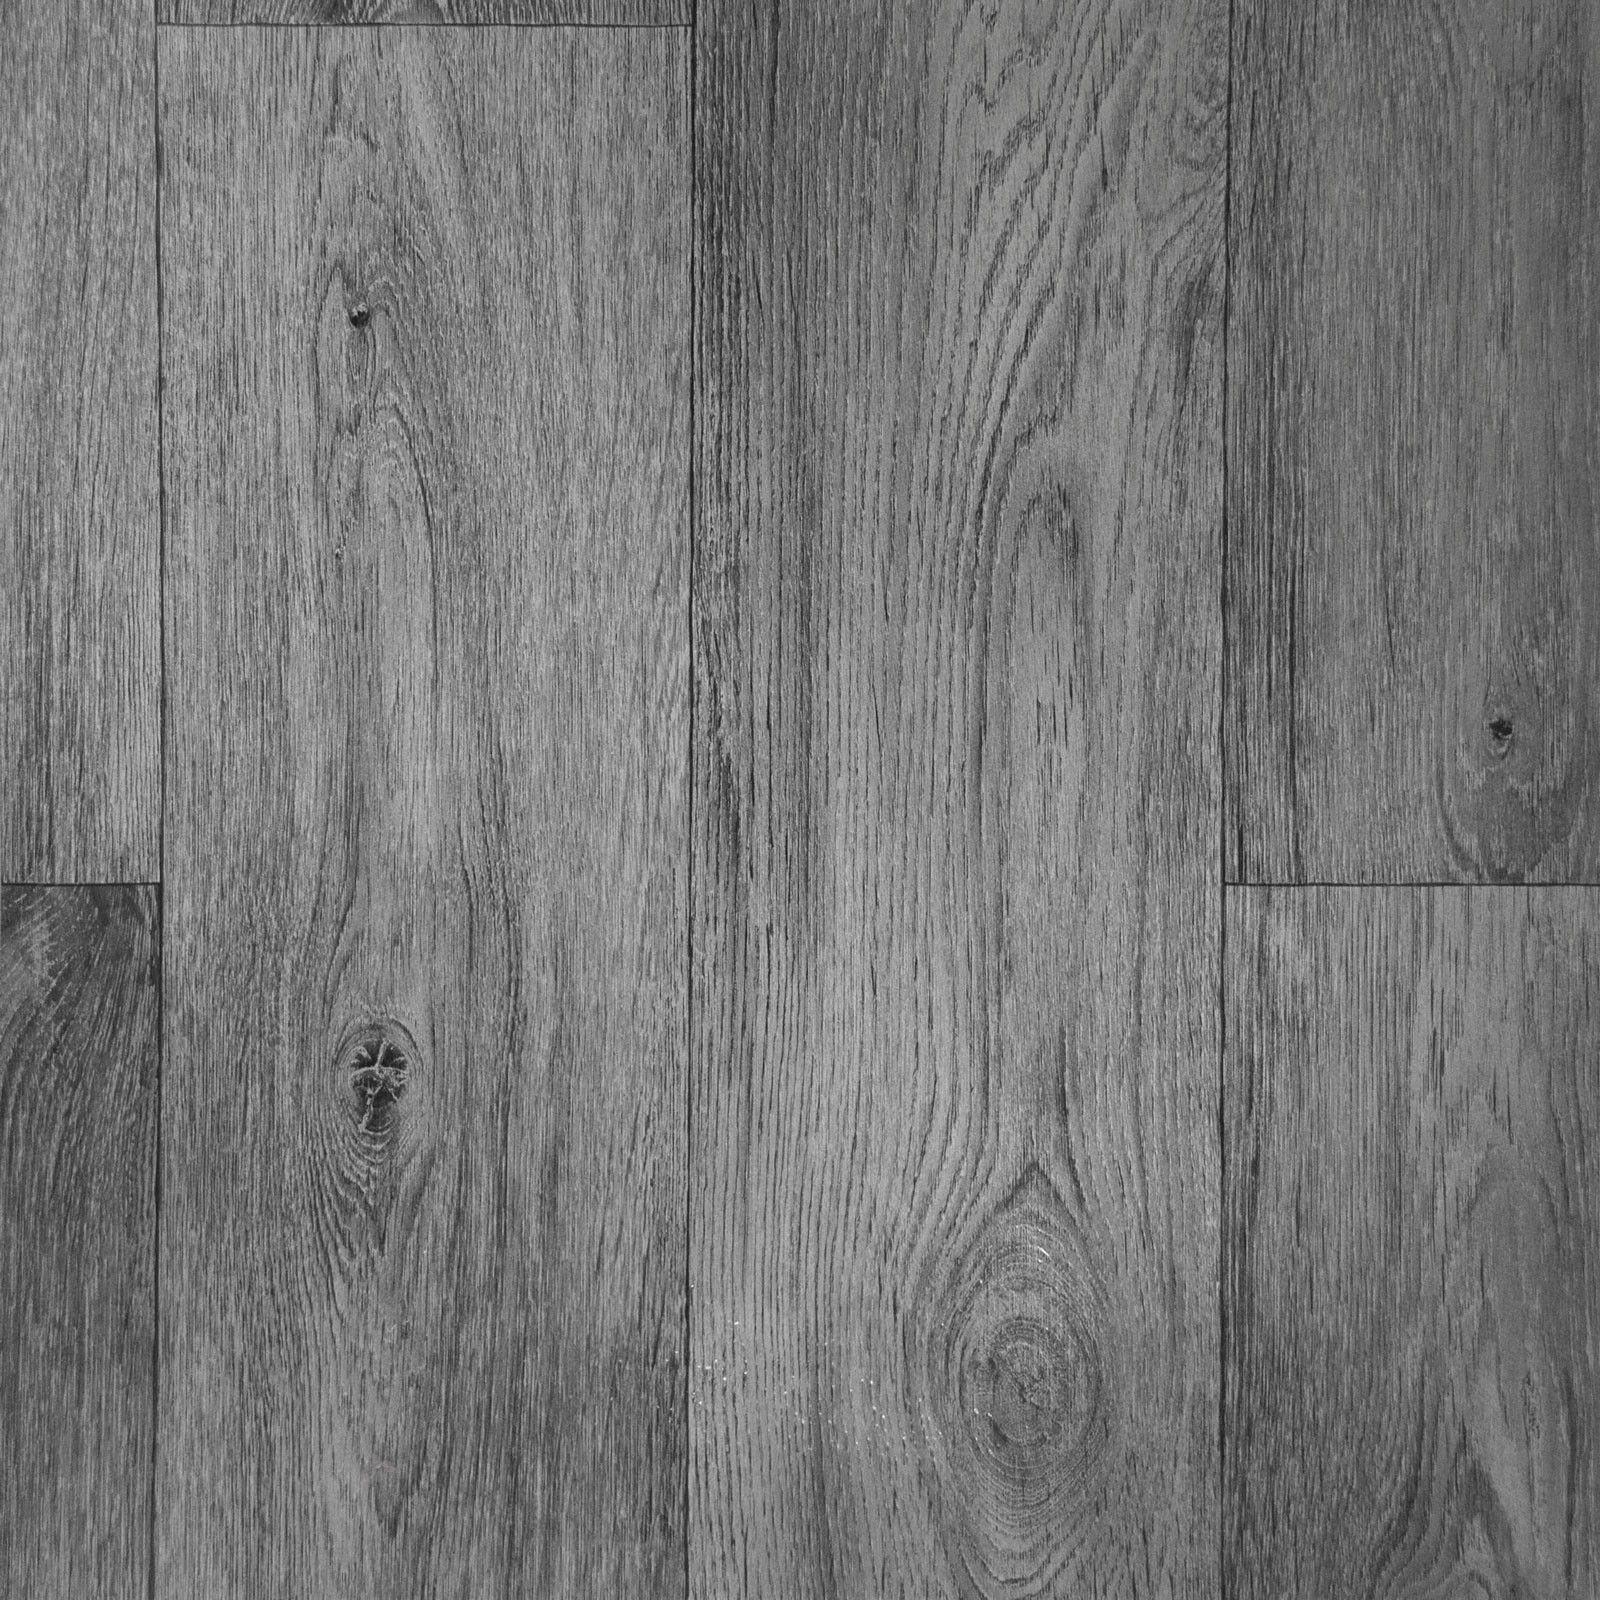 39++ Grey wood grain lino ideas